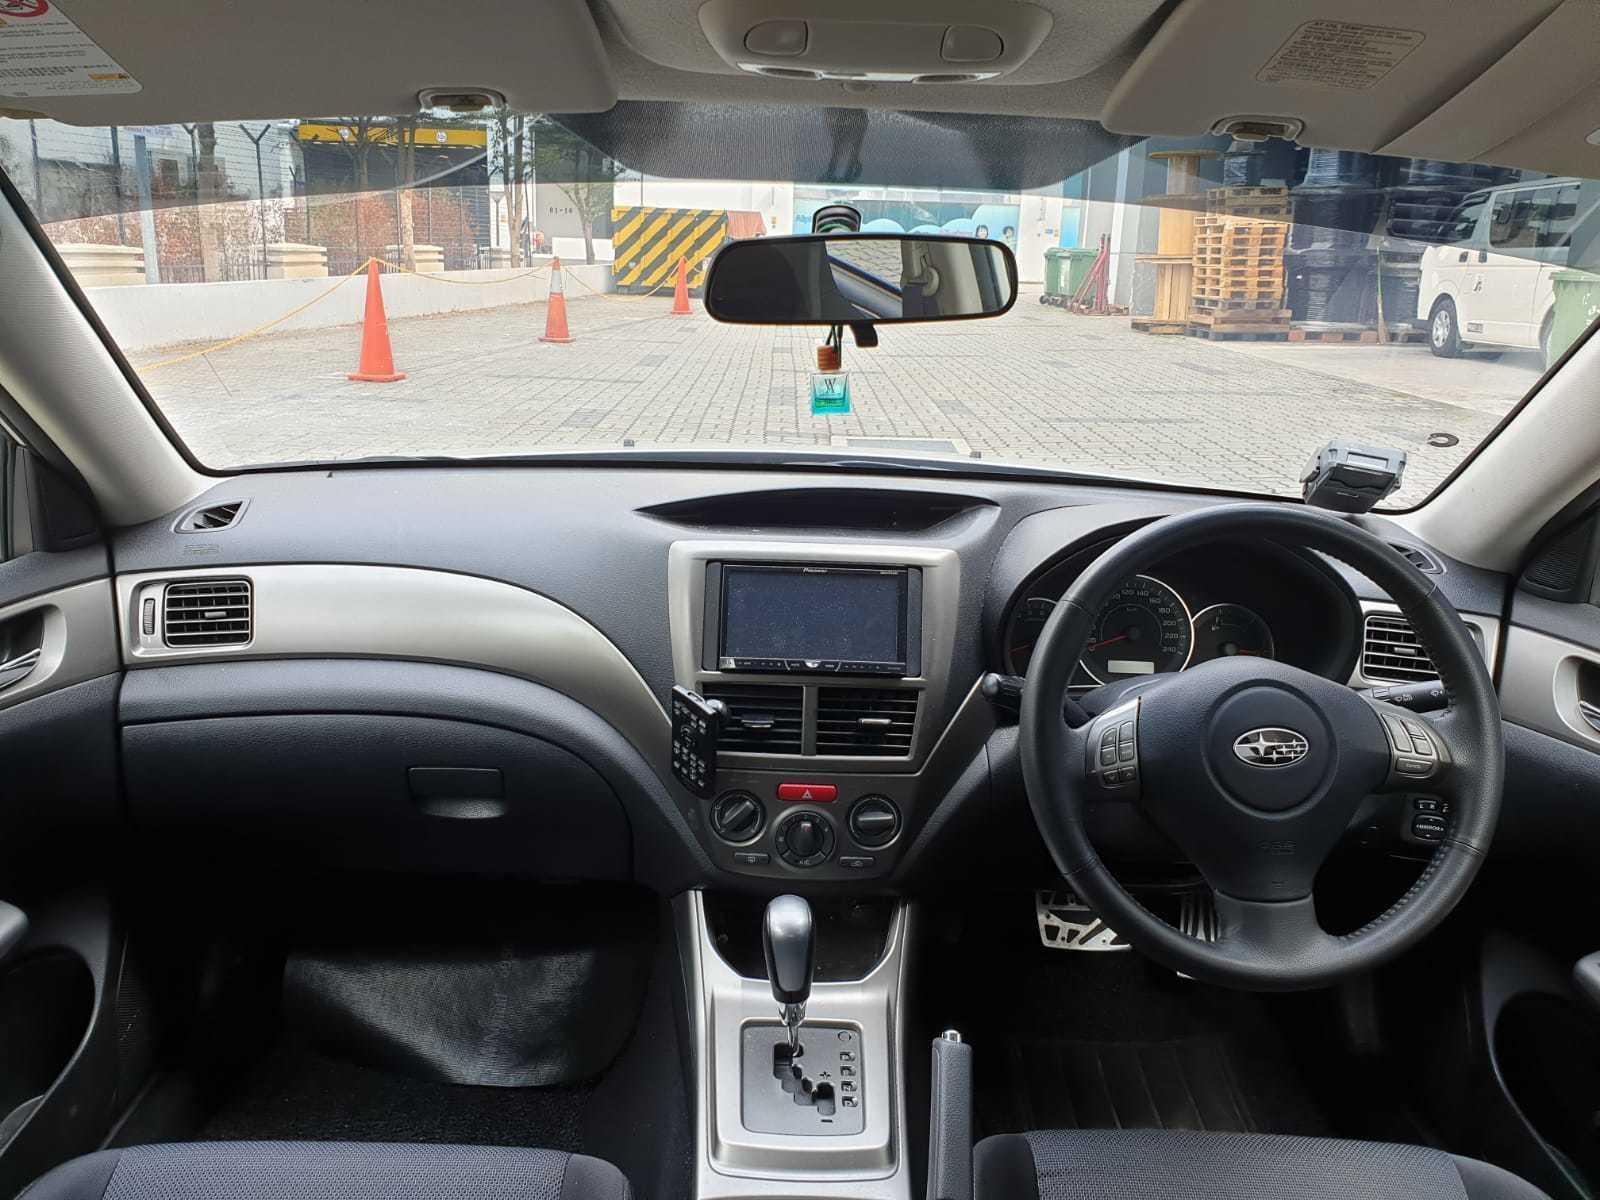 Subaru Impreza 2.0A @ Cheapest rates, full support!